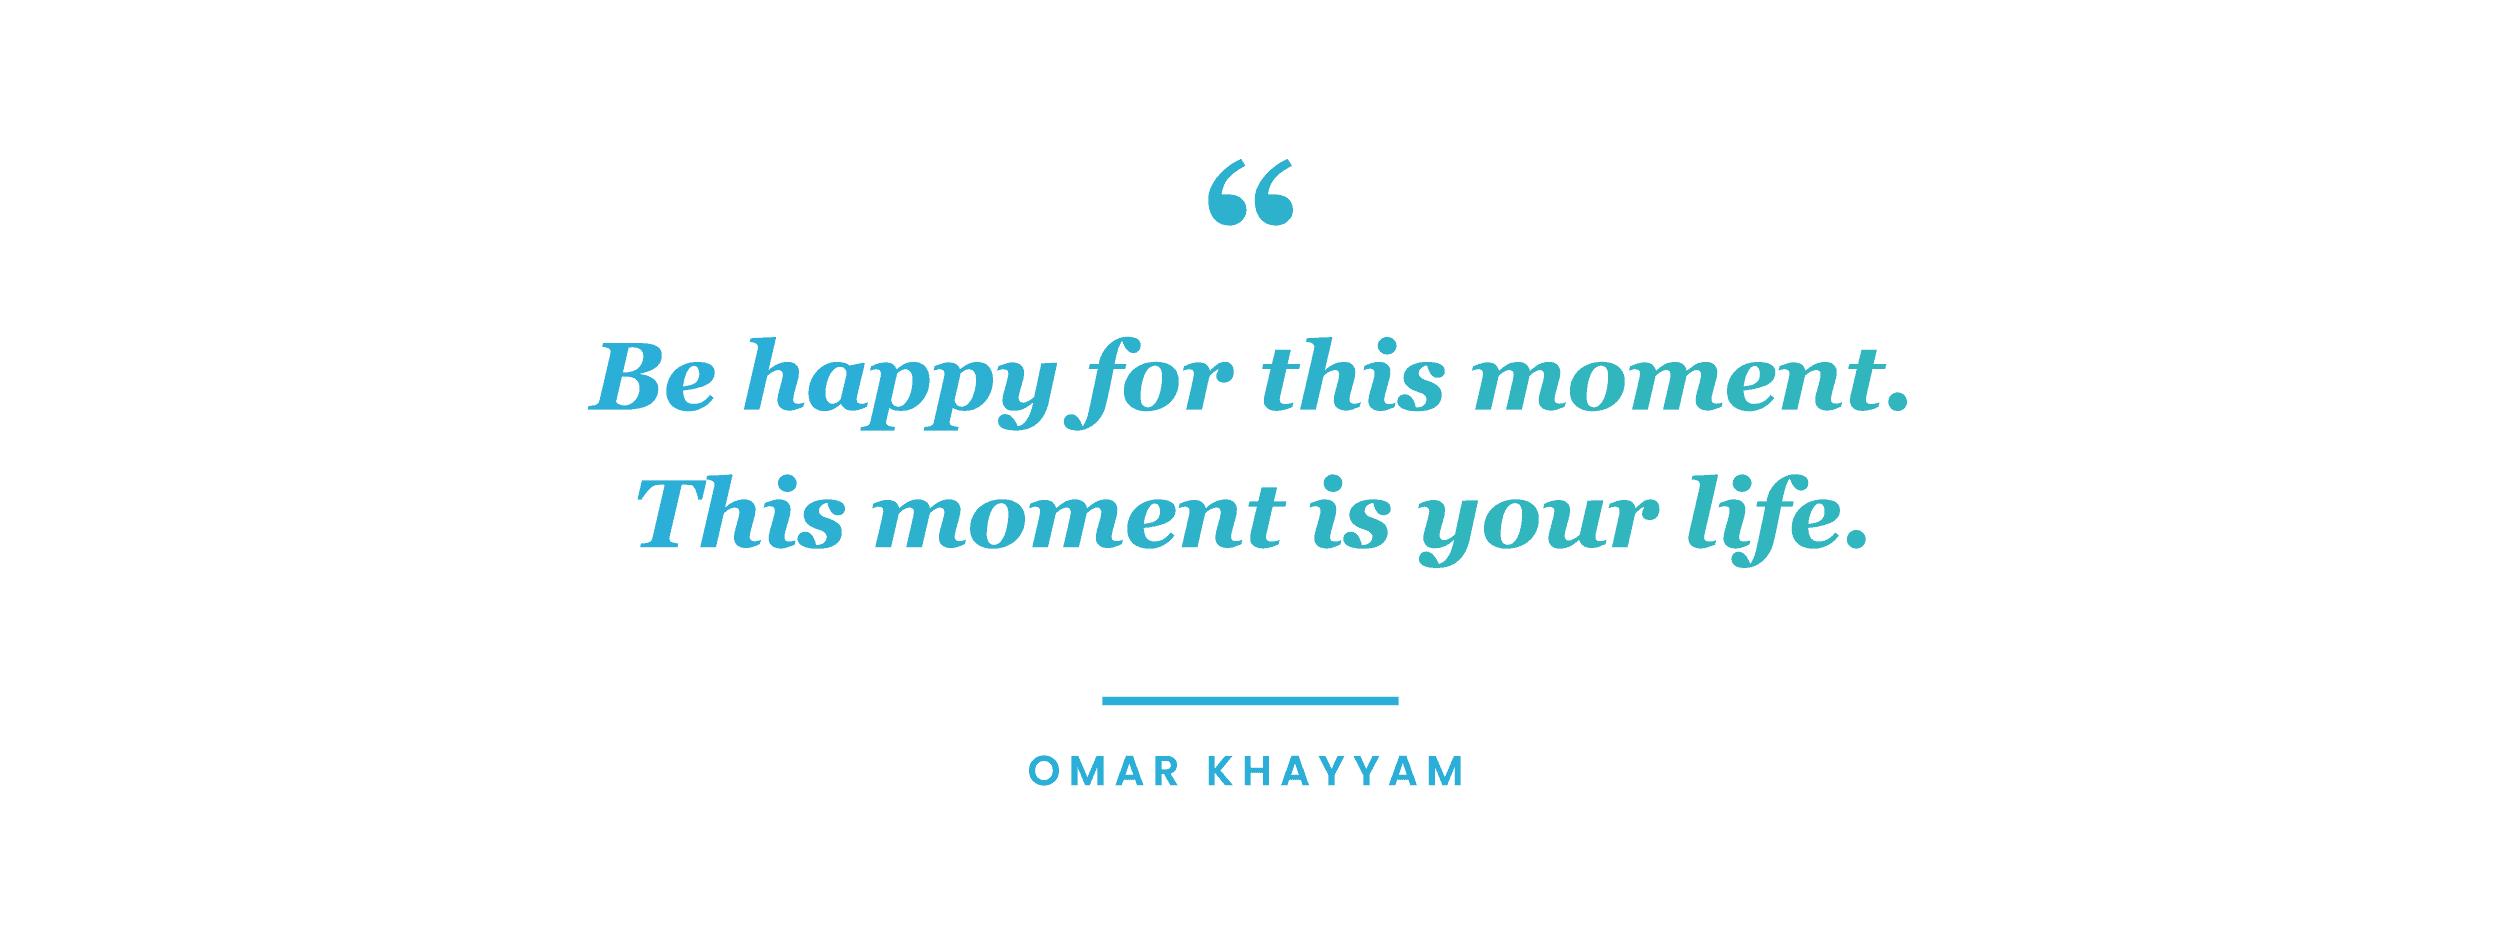 mindfulness quote by Omar Khayyam